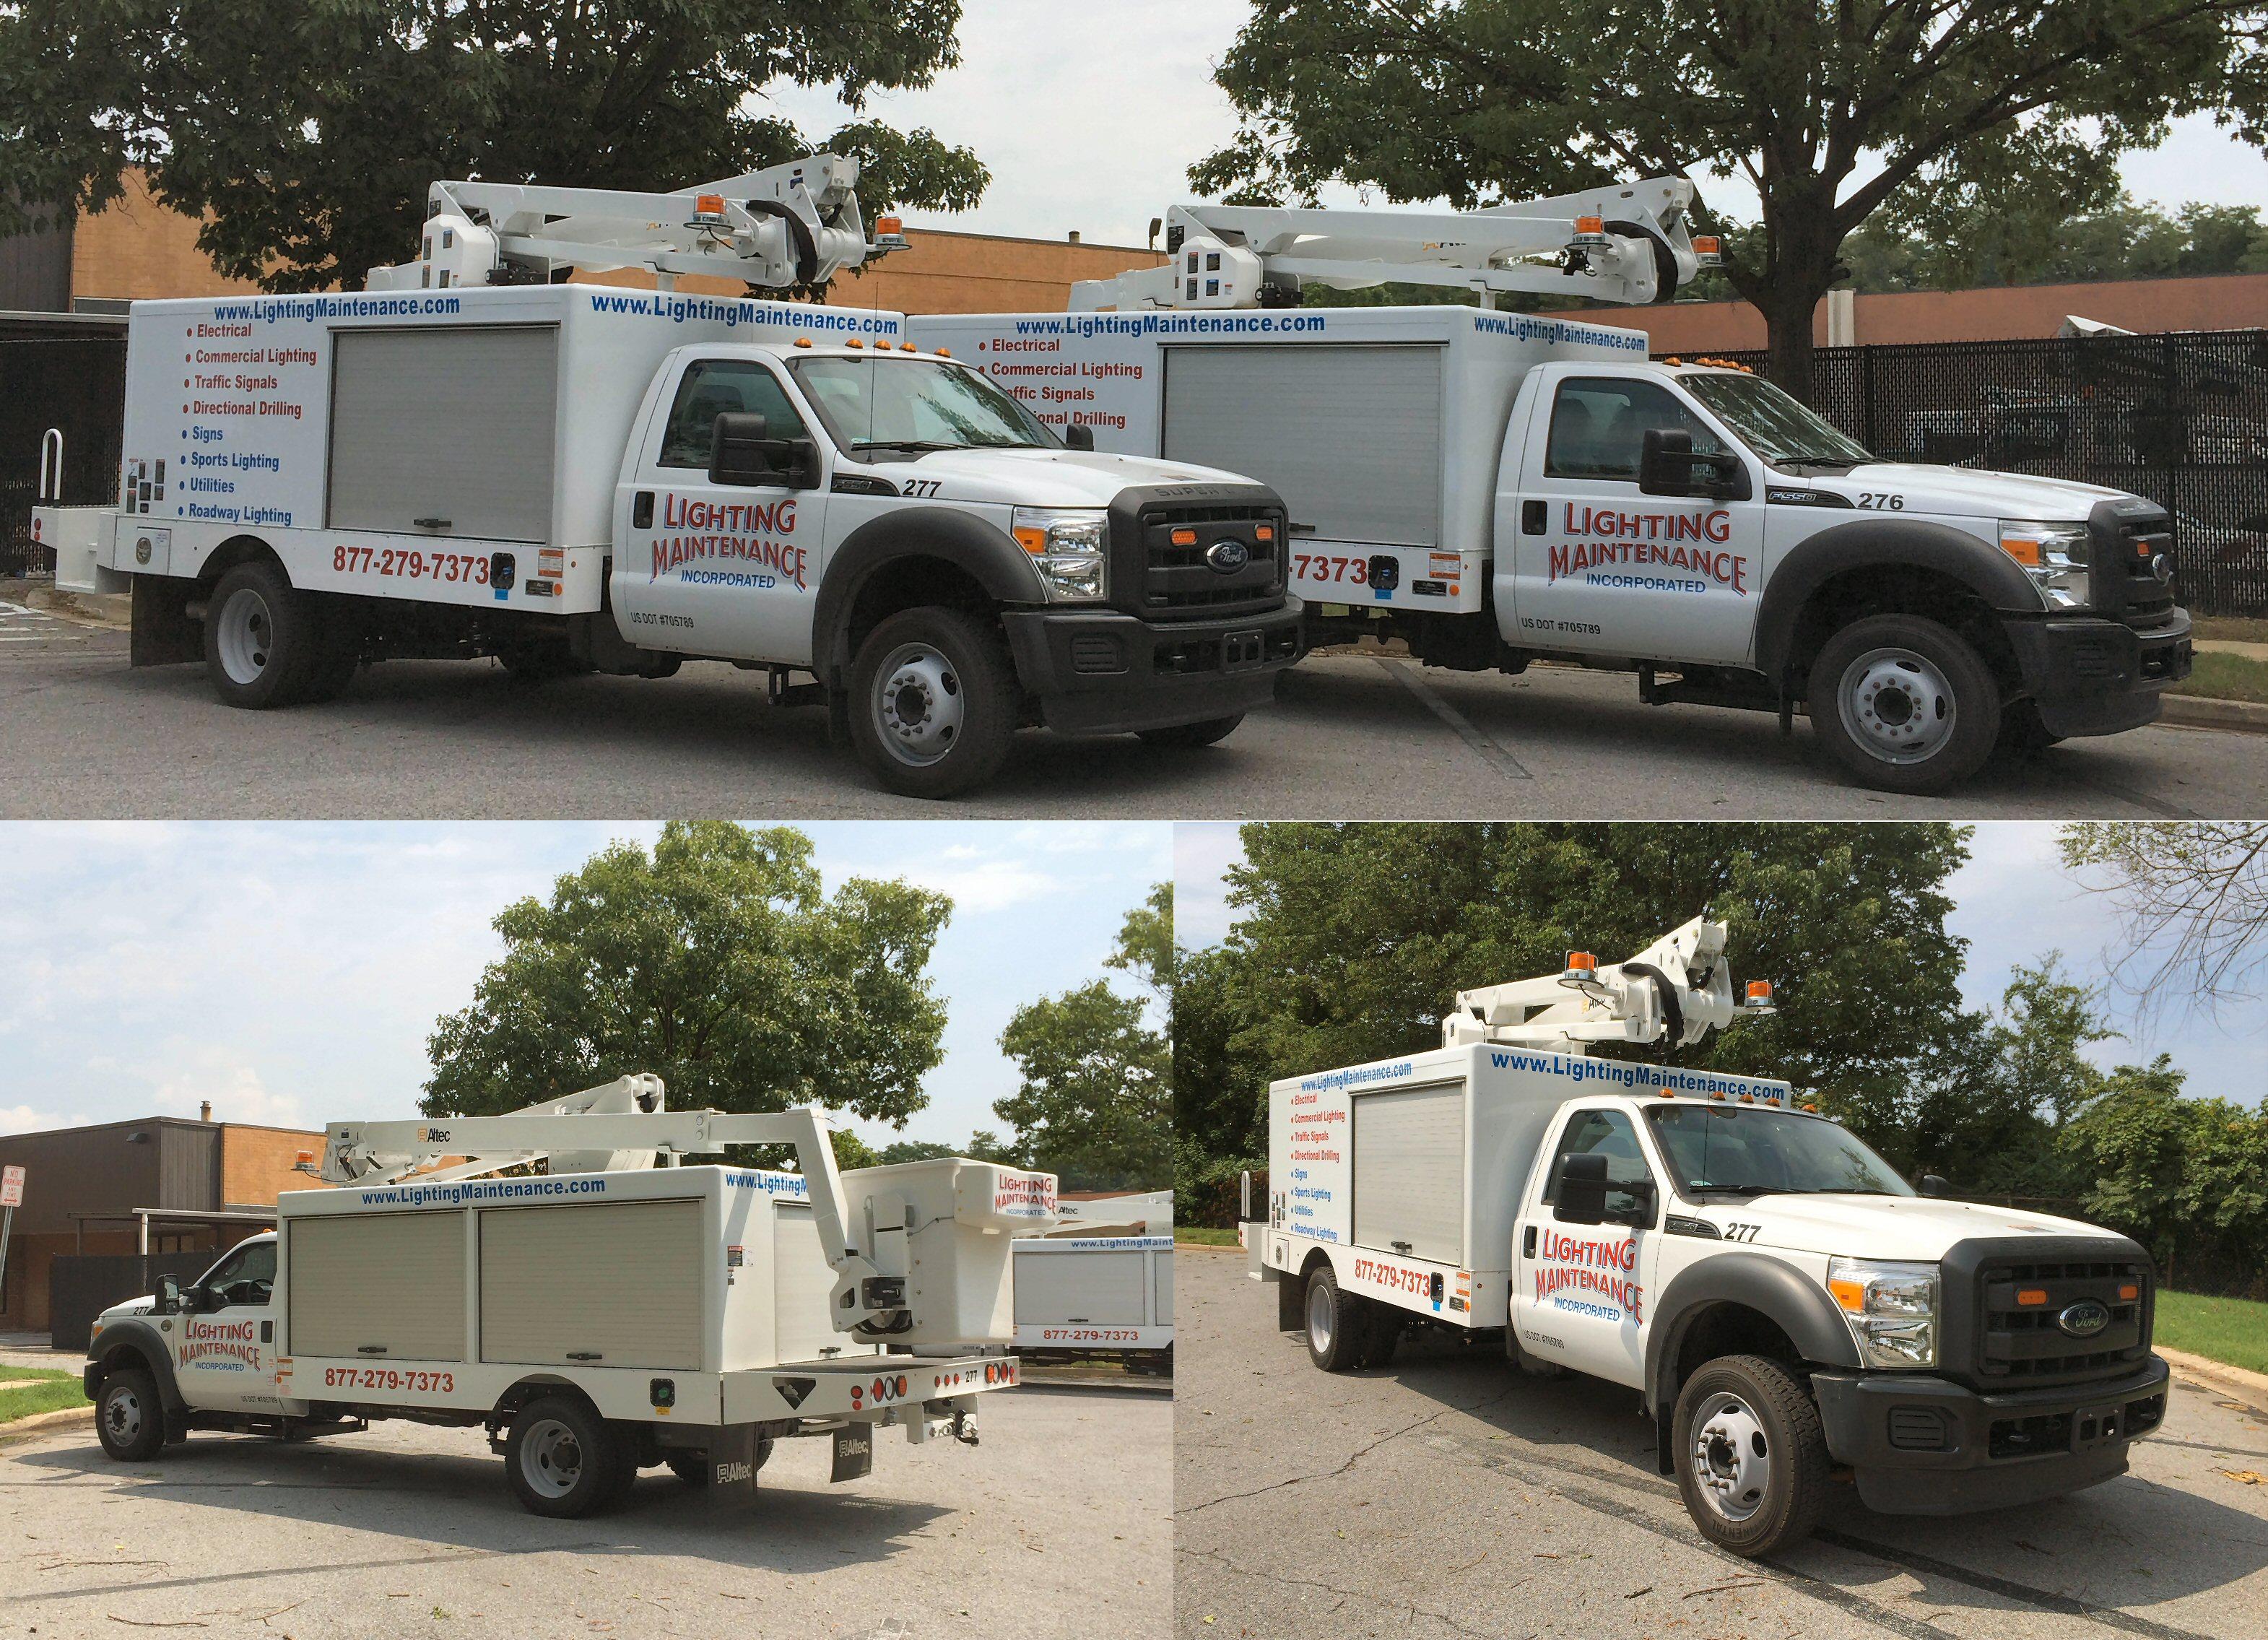 Altec bucket trucks with 48' reach